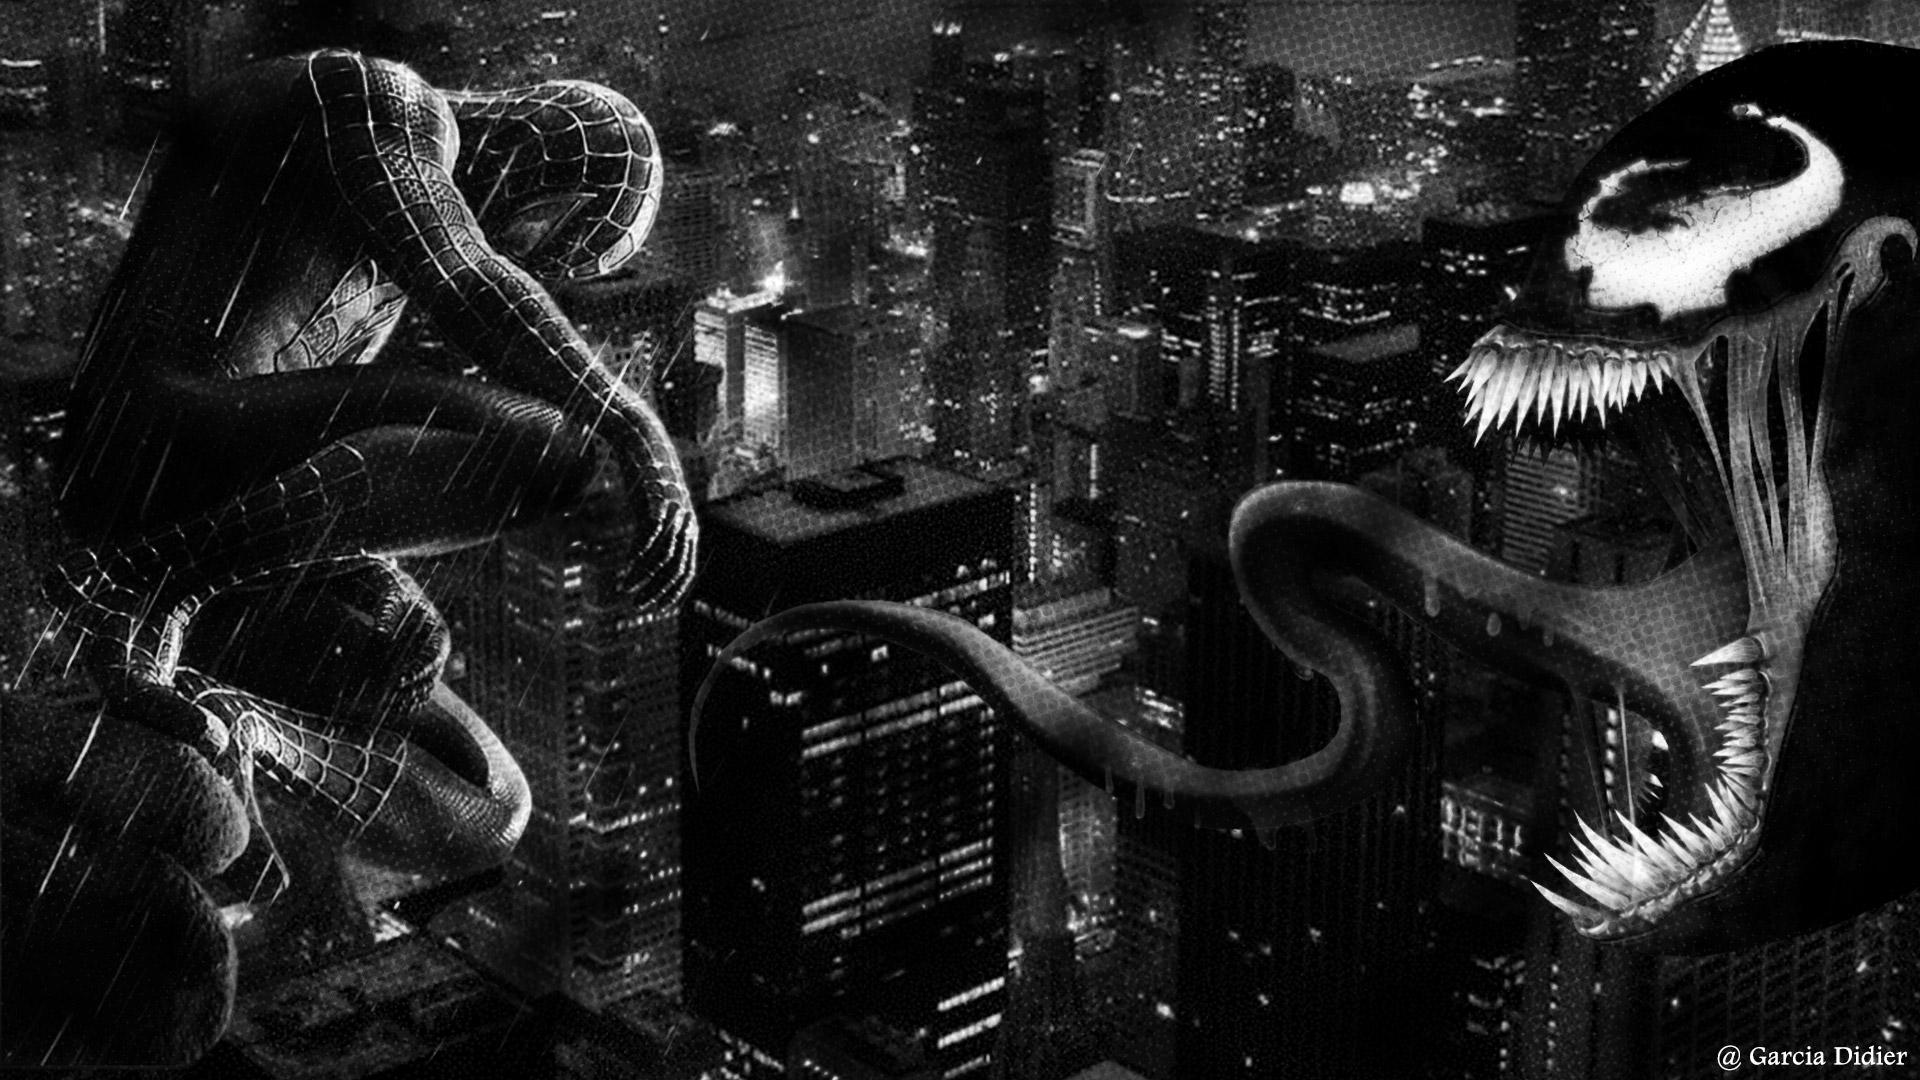 Fond ecran spiderman by dgarcia57 on deviantart for Fond decran styler